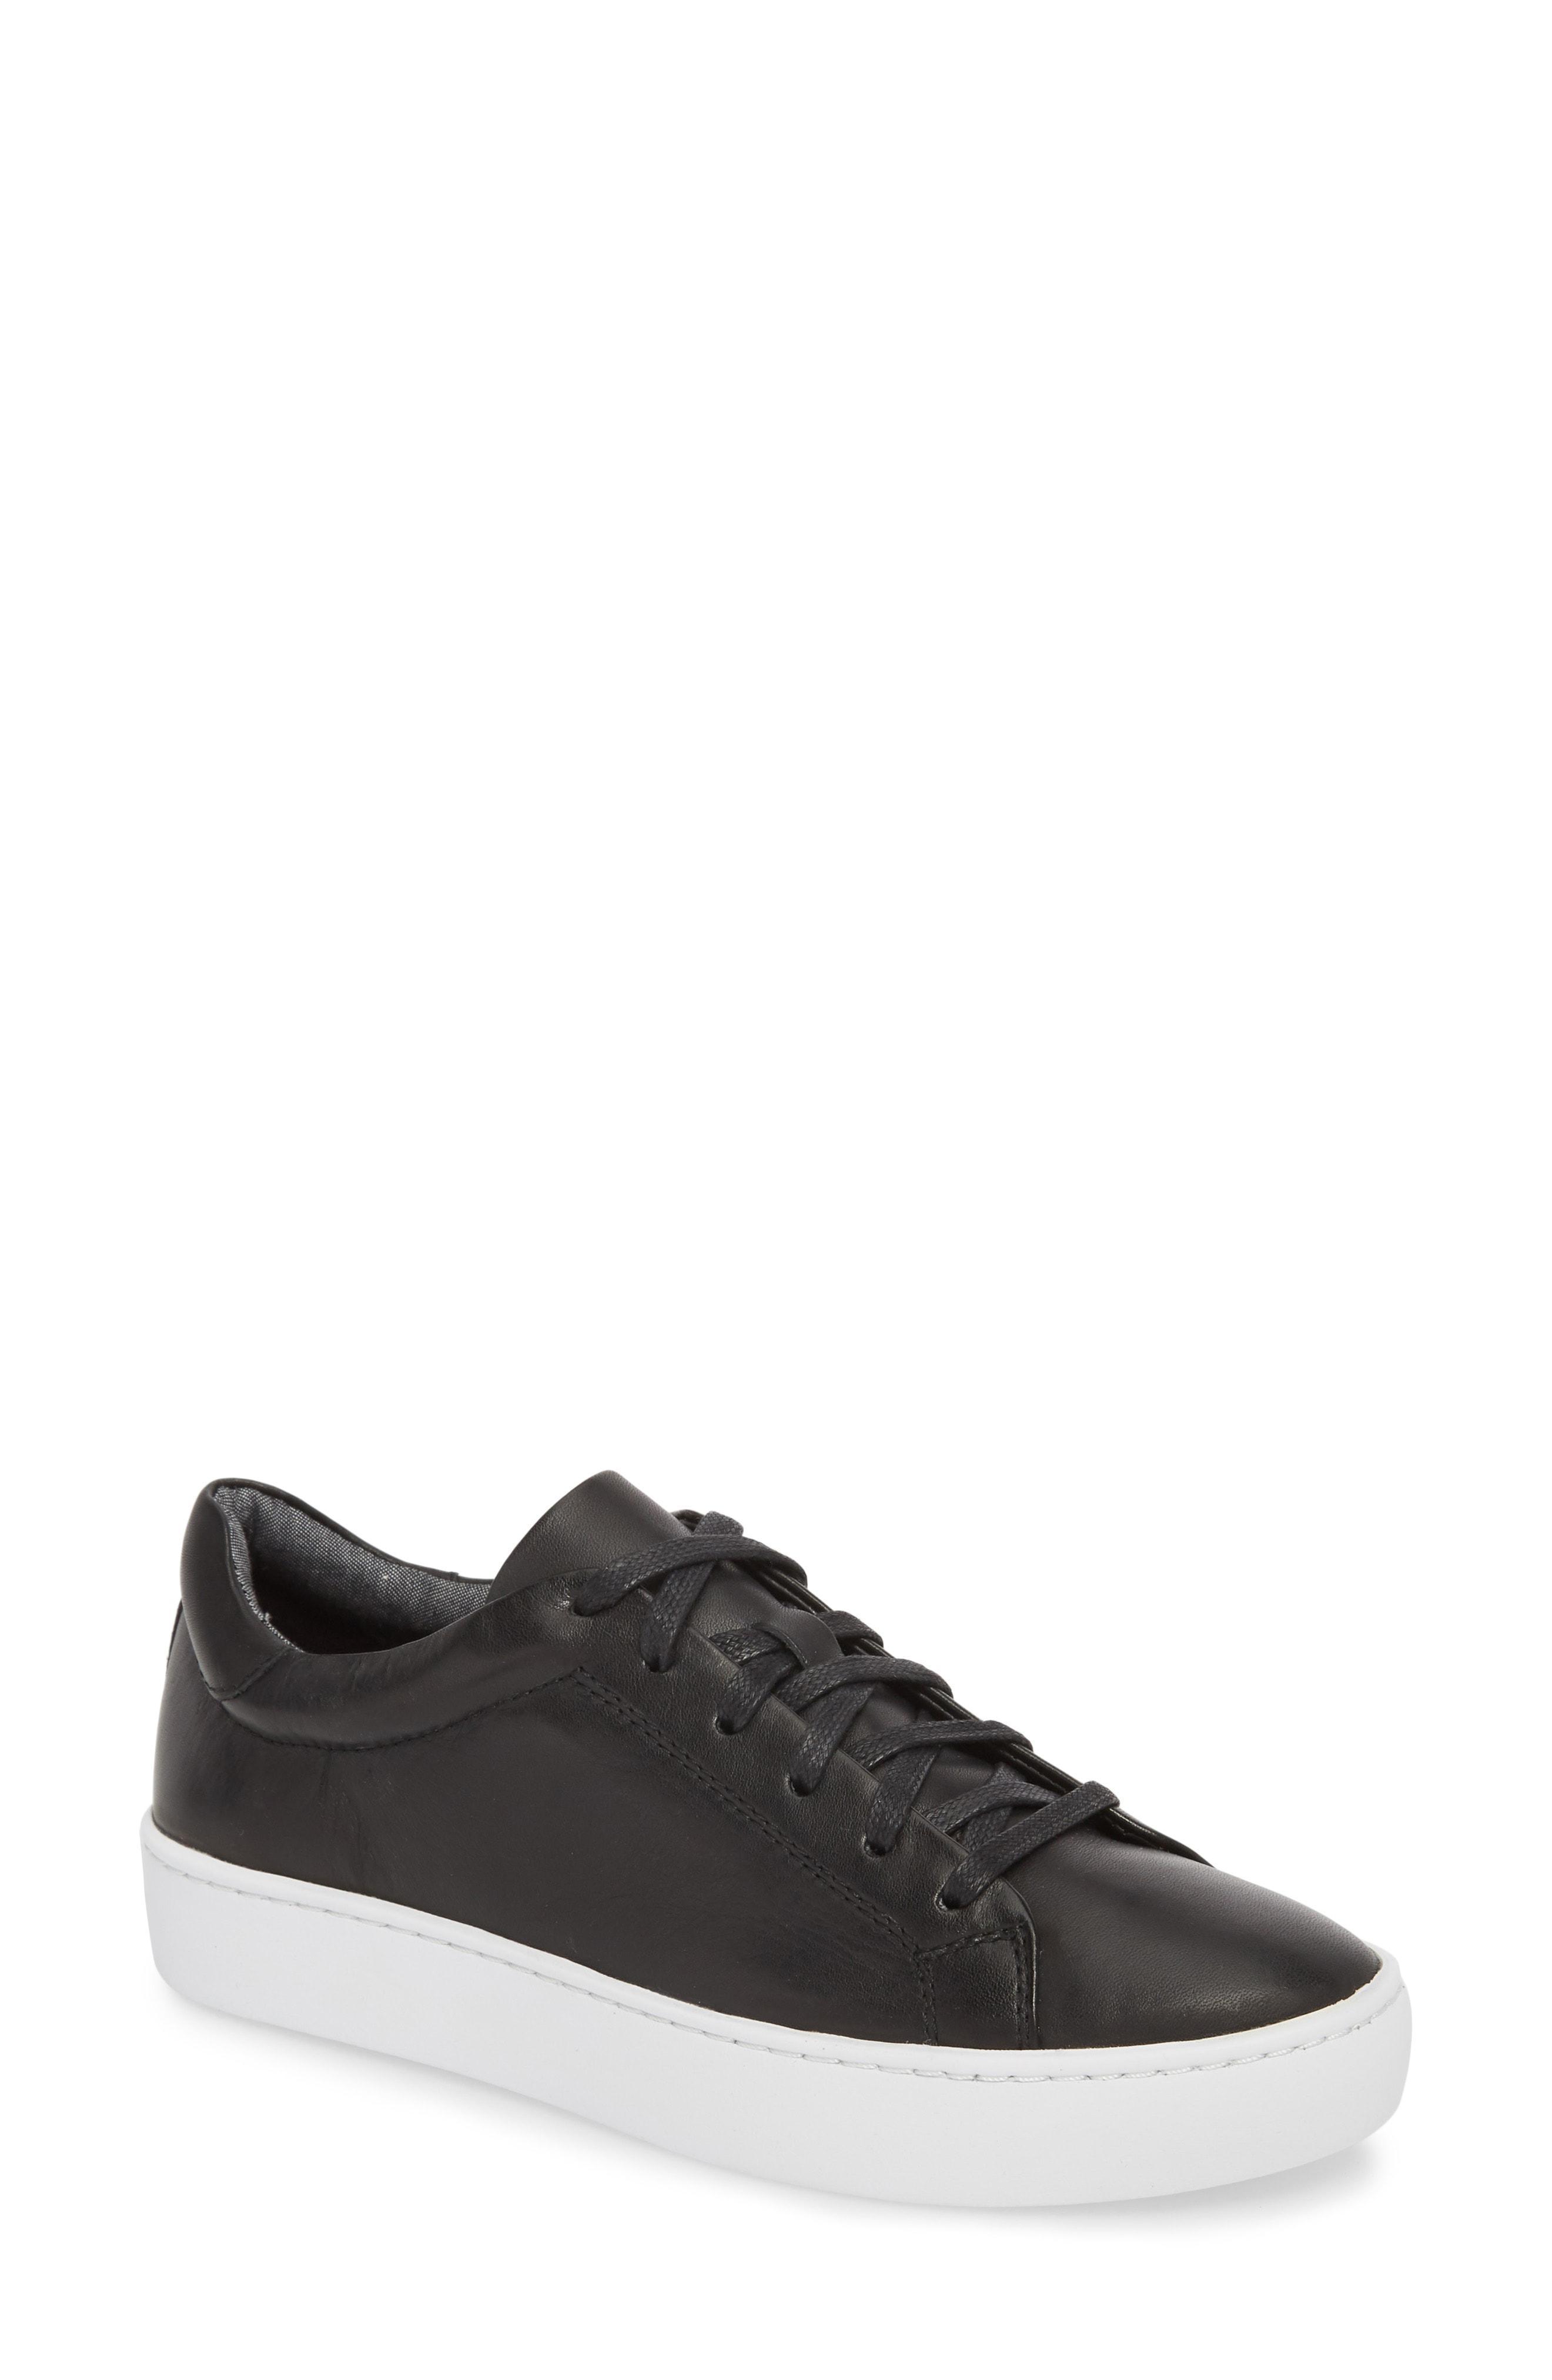 25c0551e45 Lyst - Vagabond Shoemakers Zoe Sneaker in Black